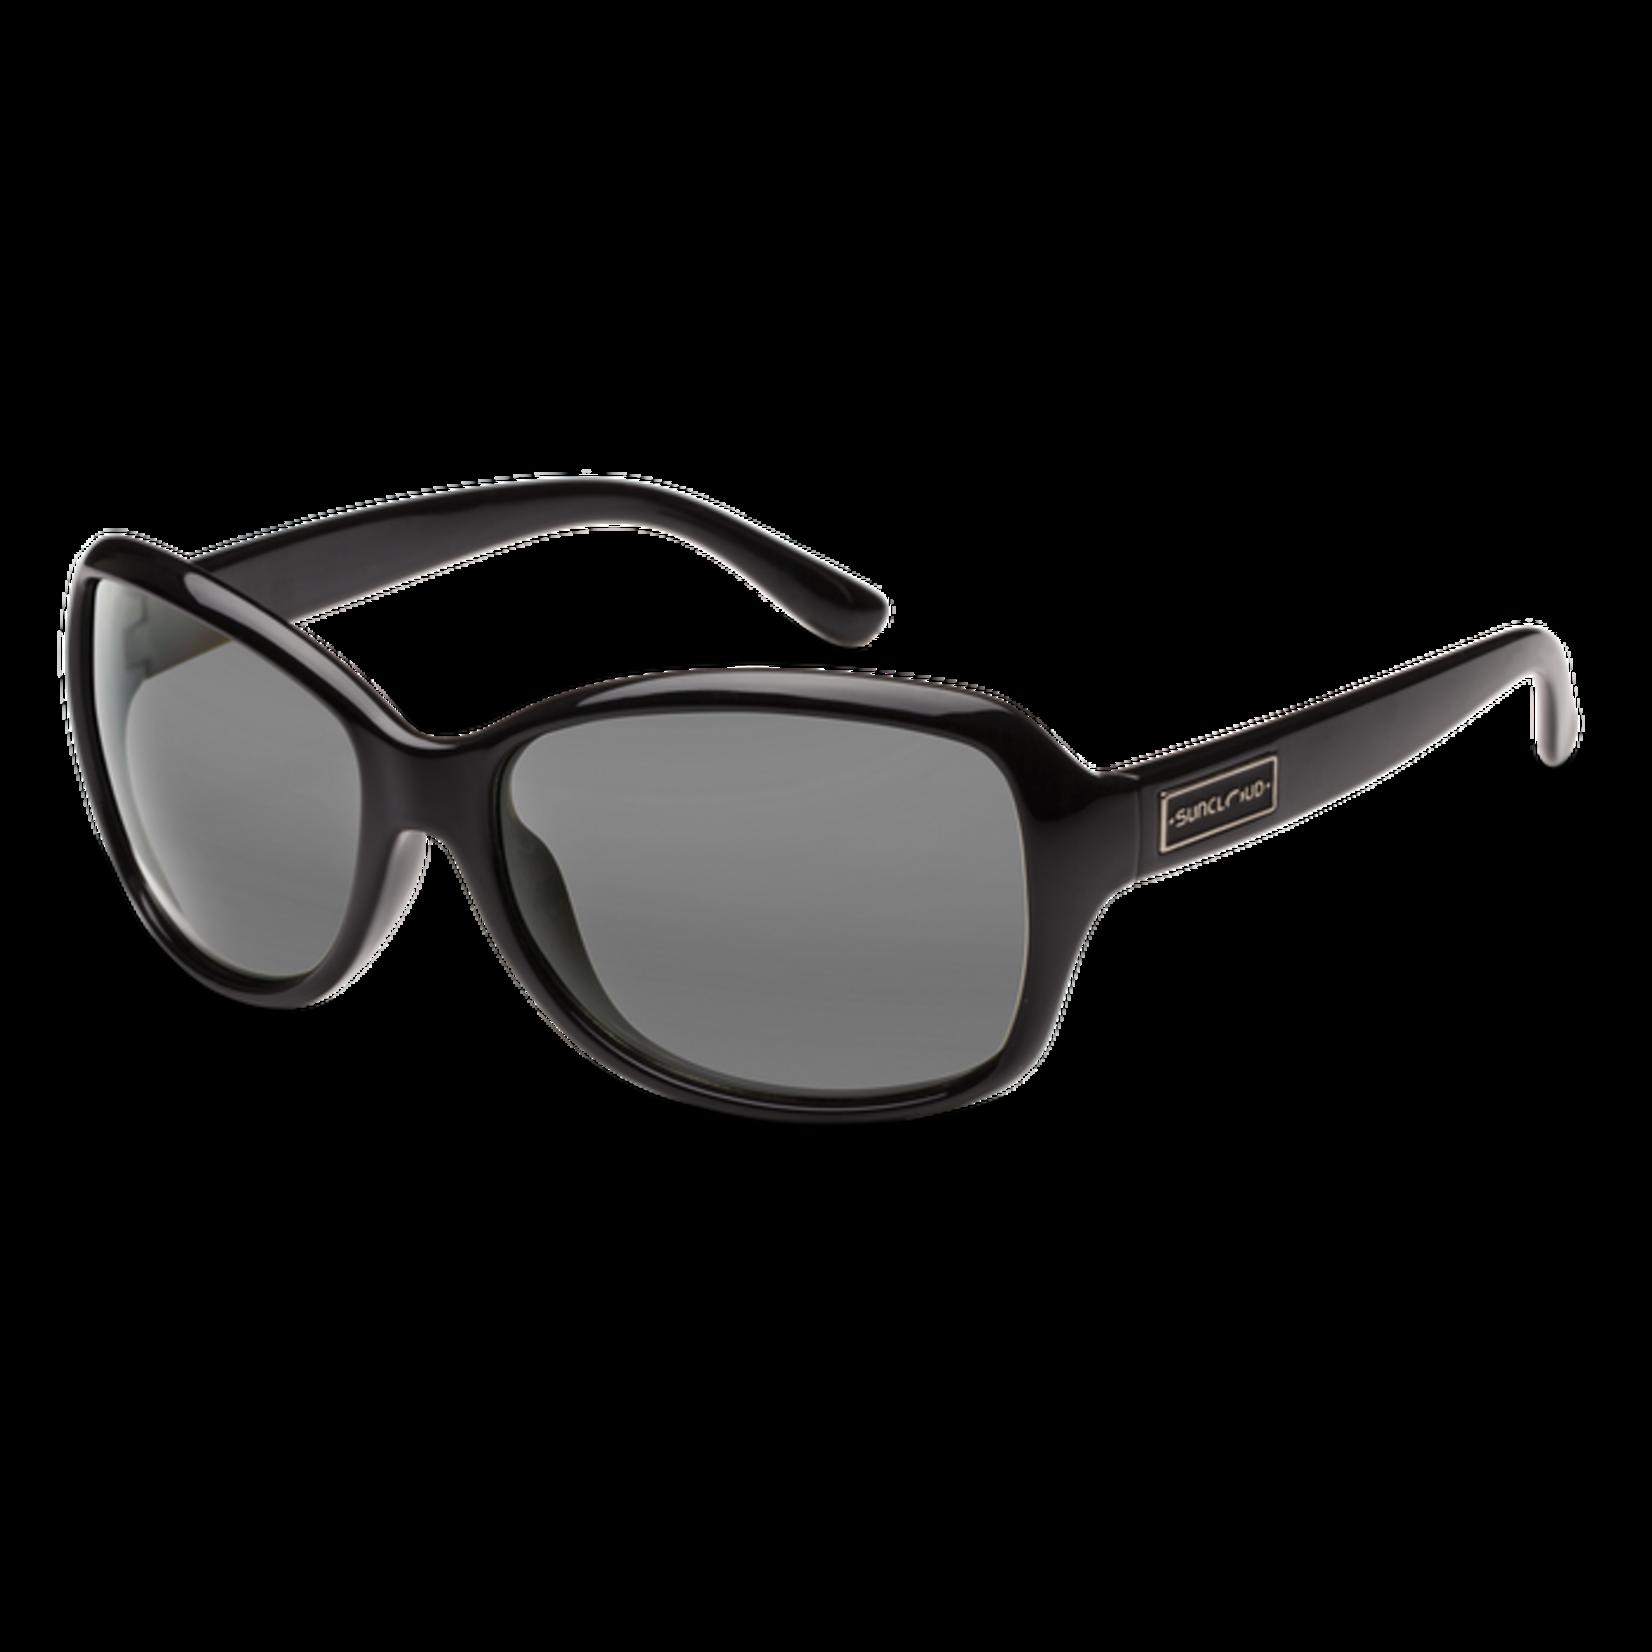 Suncloud Optics Suncloud Mosaic Polarized Sunglasses